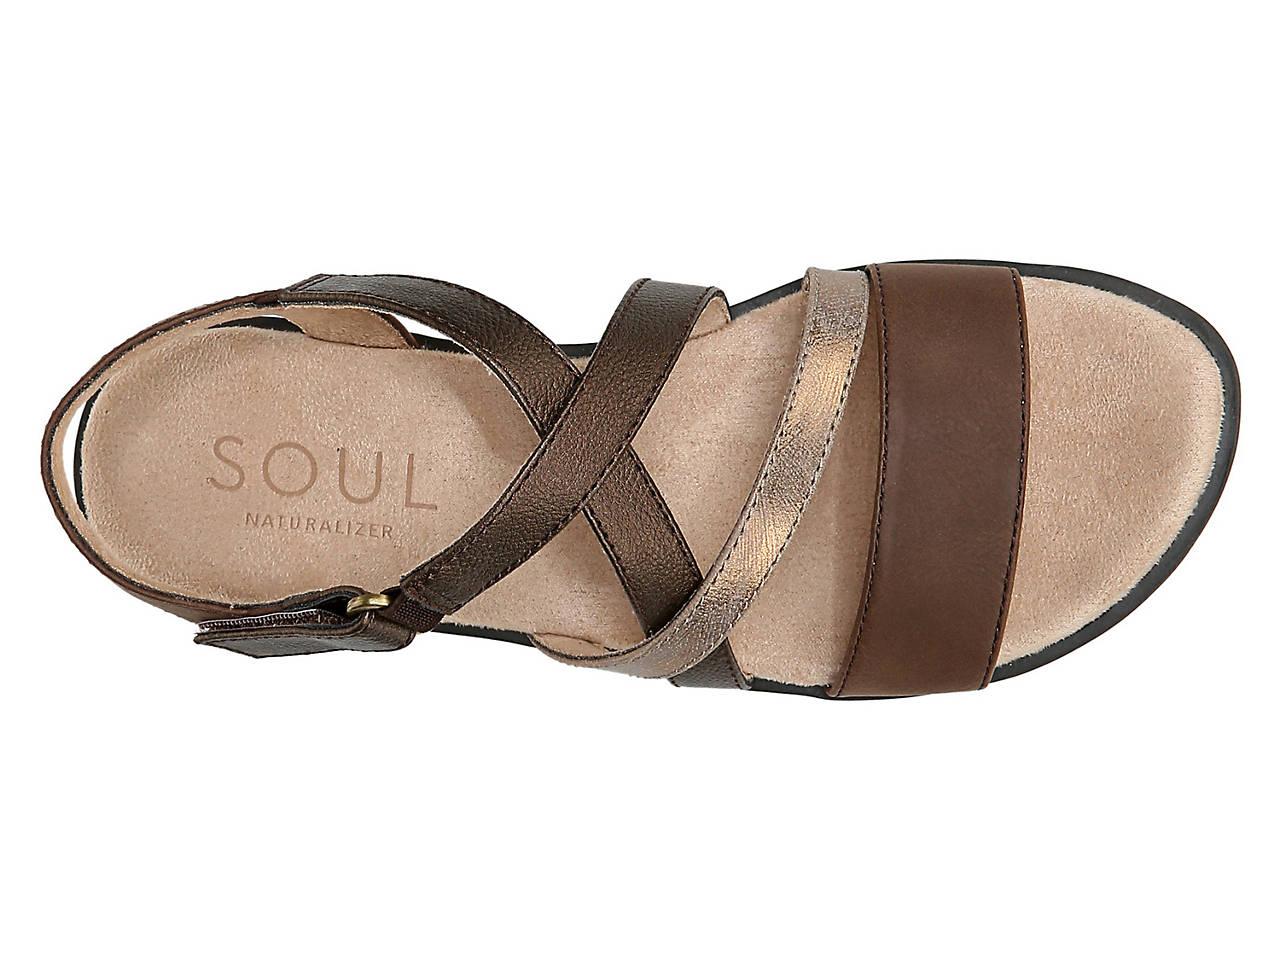 Natural Soul by Naturalizer Womens Jem Sandals Sz 9.5